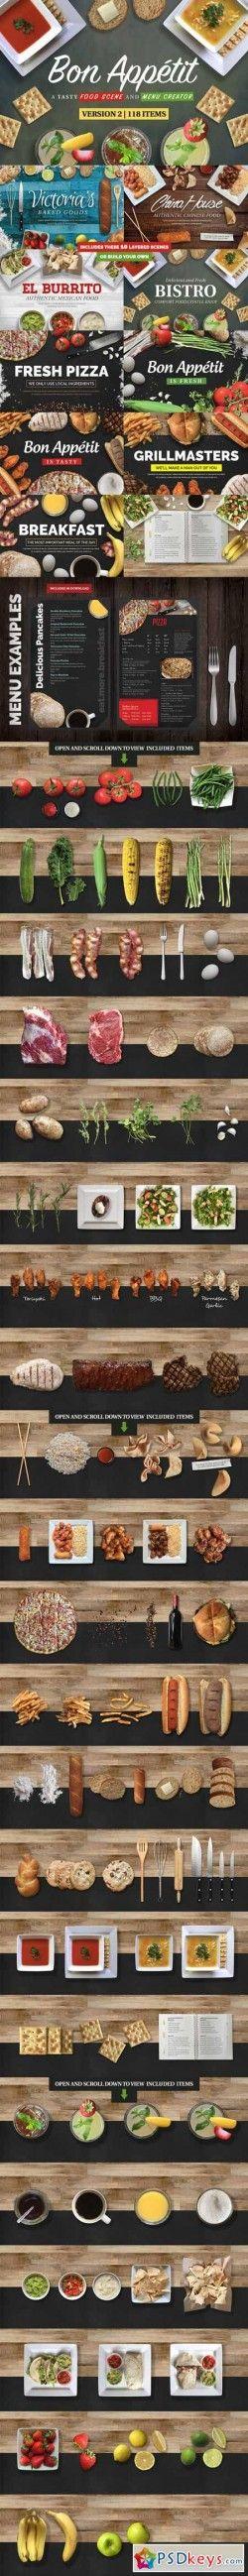 Food Scene Menu Creator 268790 » Free Download Photoshop Vector Stock image Via Torrent Zippysha ...